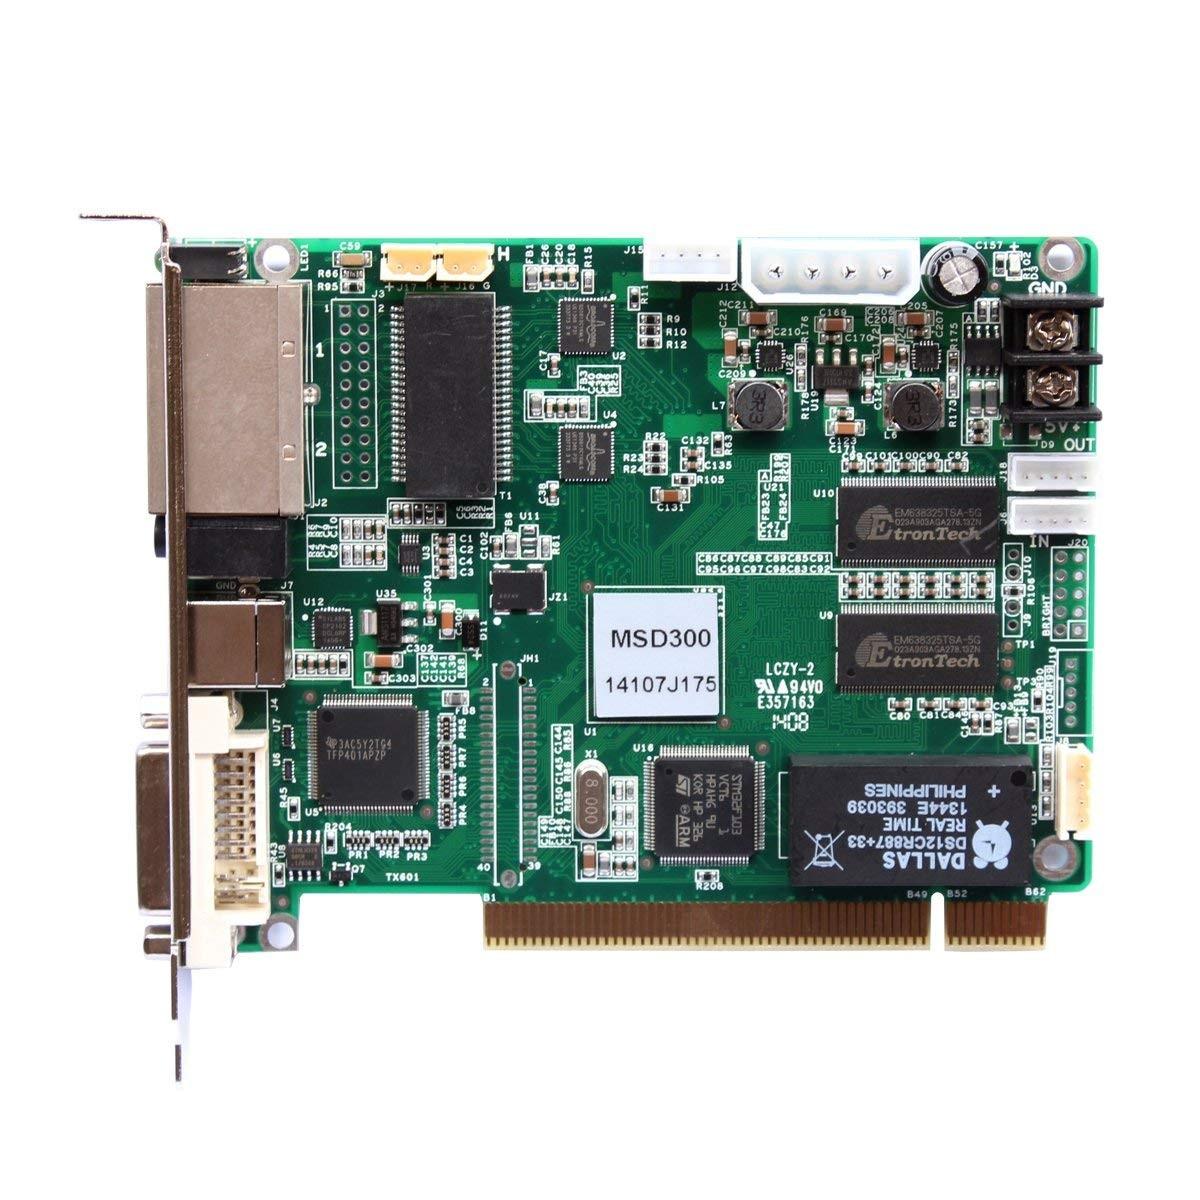 NovaStar Synchronous Sending Card MSD300